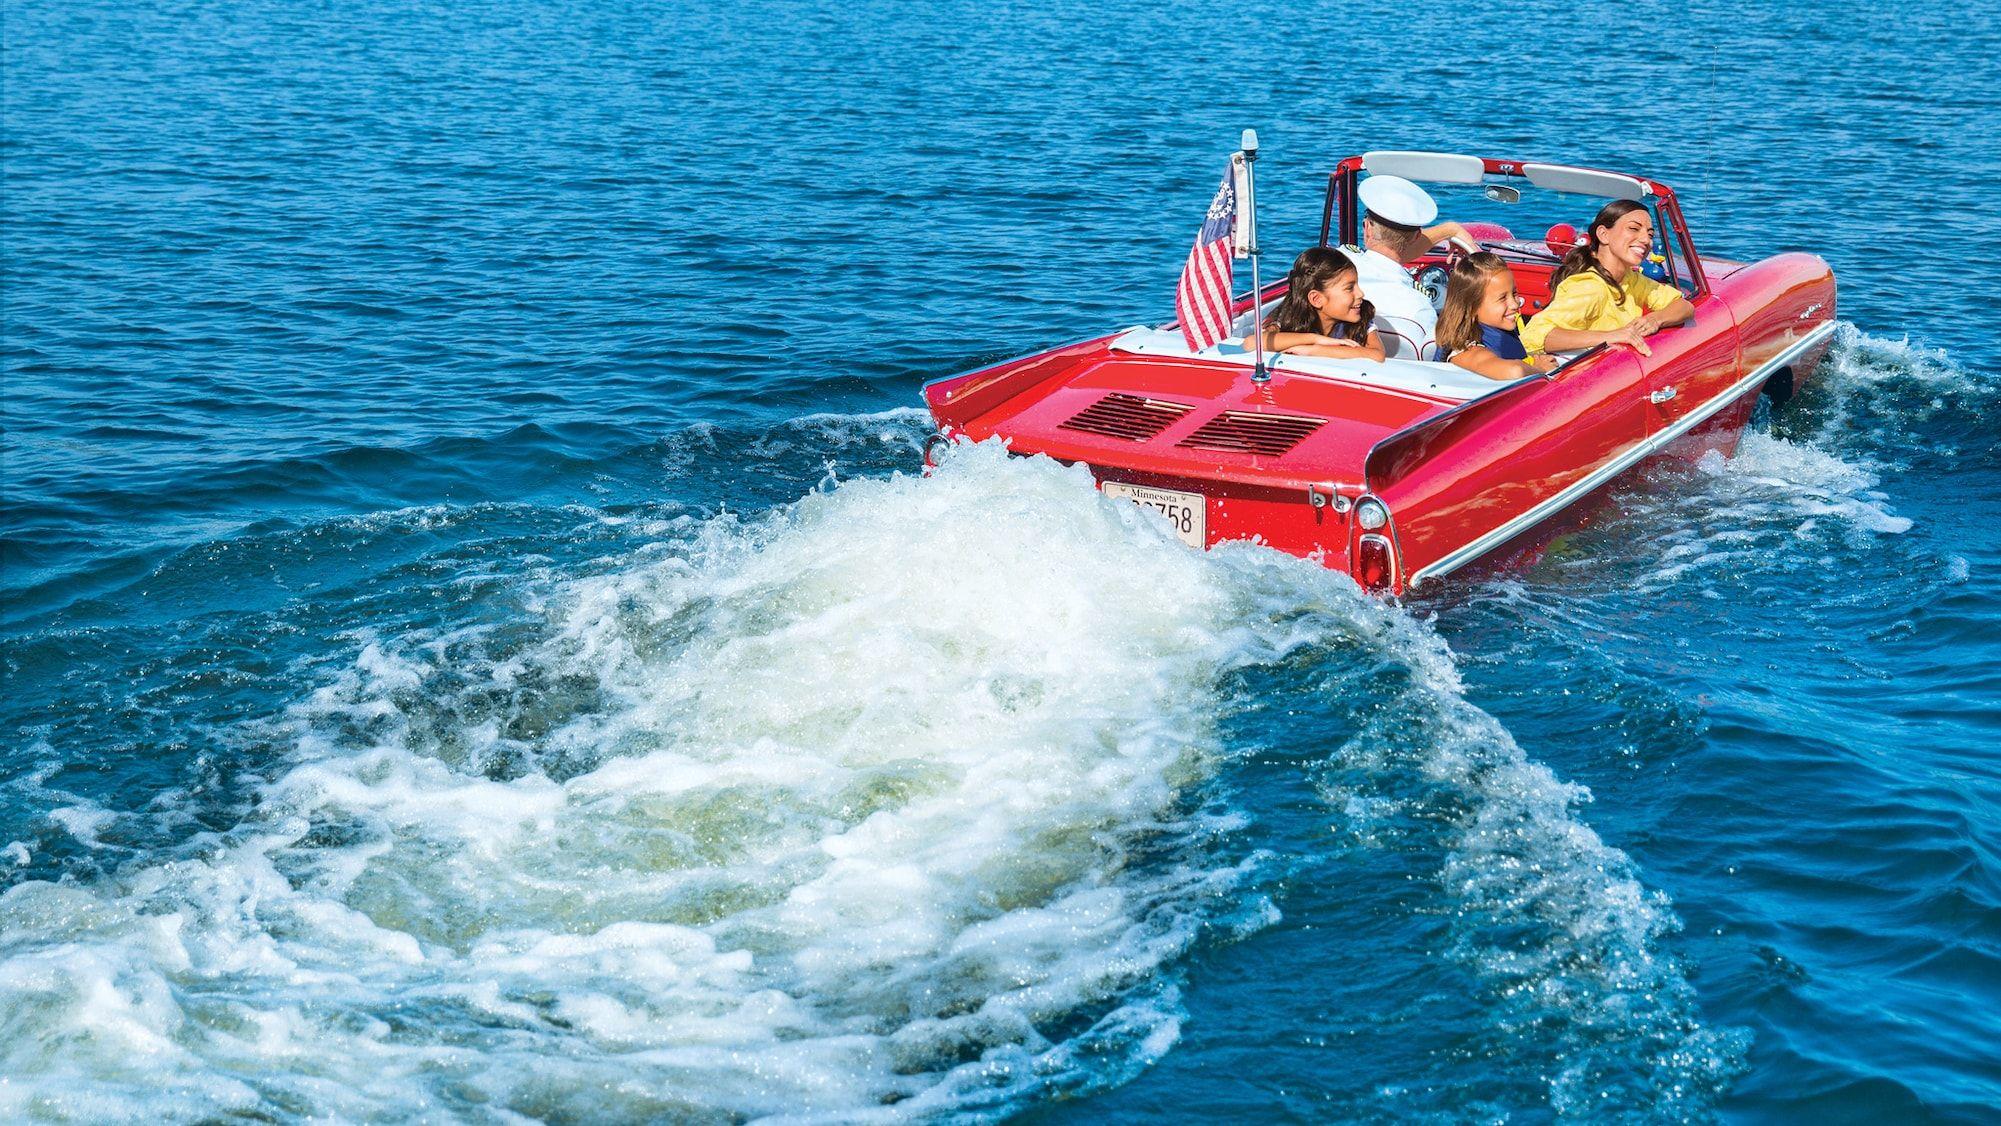 Vintage Amphicar Italian Water Taxi Tours Disney Springs